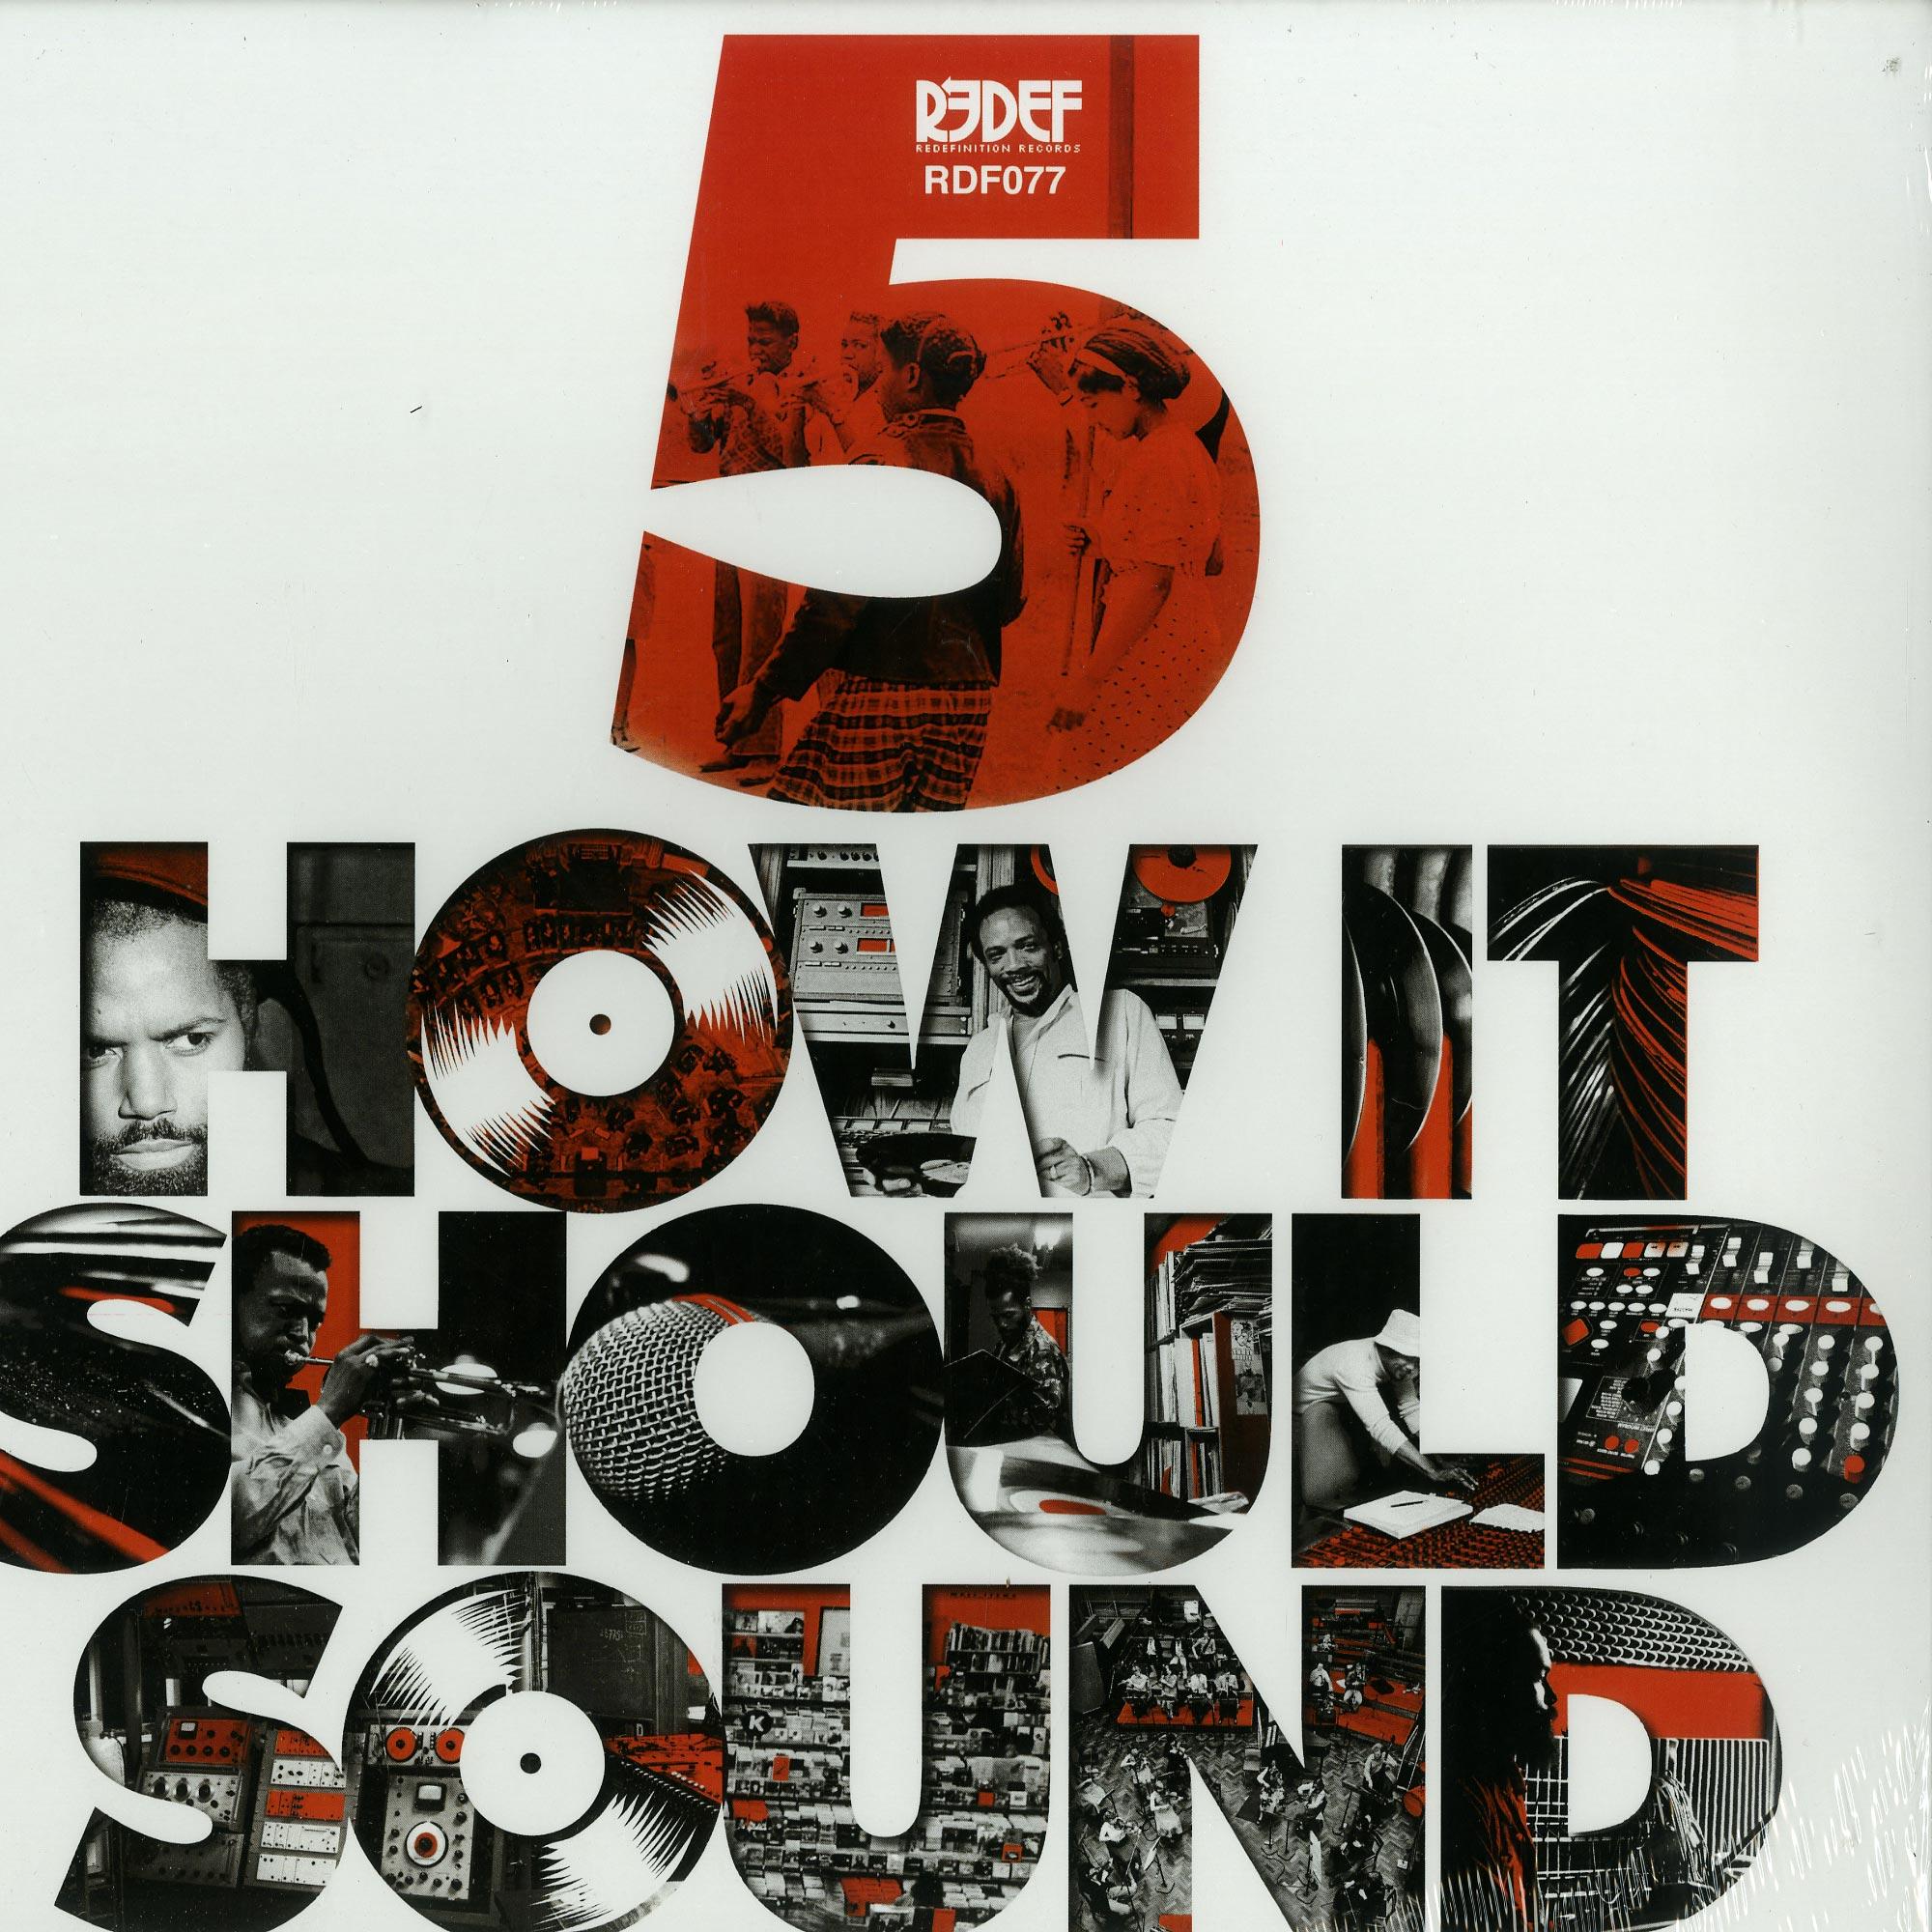 Damu The Fudgemunk - HOW IT SHOULD SOUND VOLUME 5